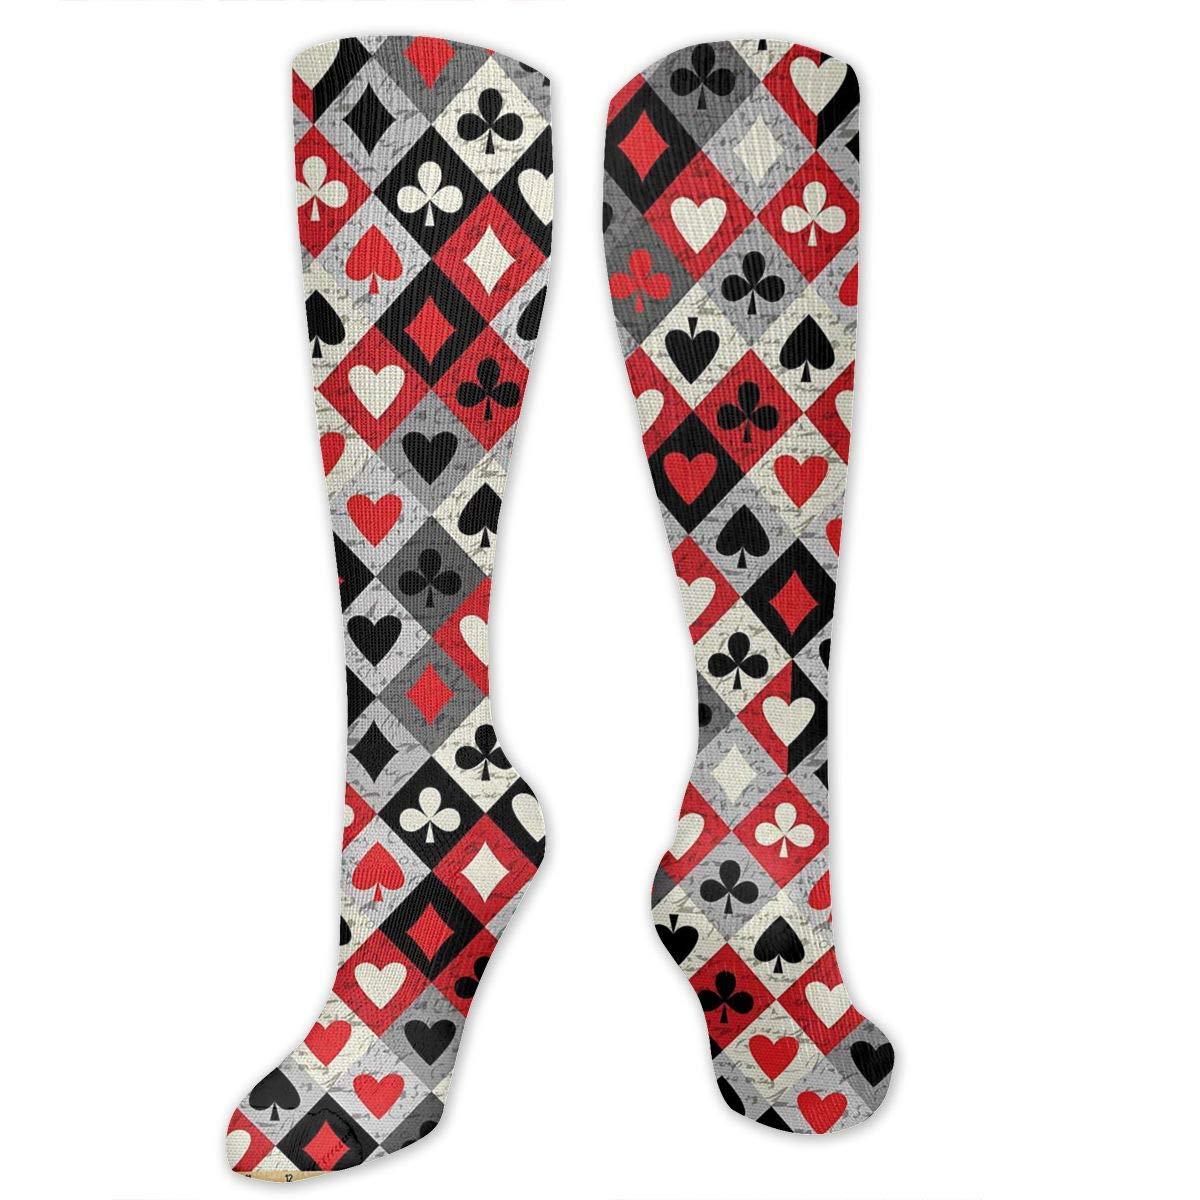 Men Multicolored Pattern Fashionable Fun Crew Cotton Socks Chanwazibibiliu Crystal in The Dark Mens Colorful Dress Socks Funky